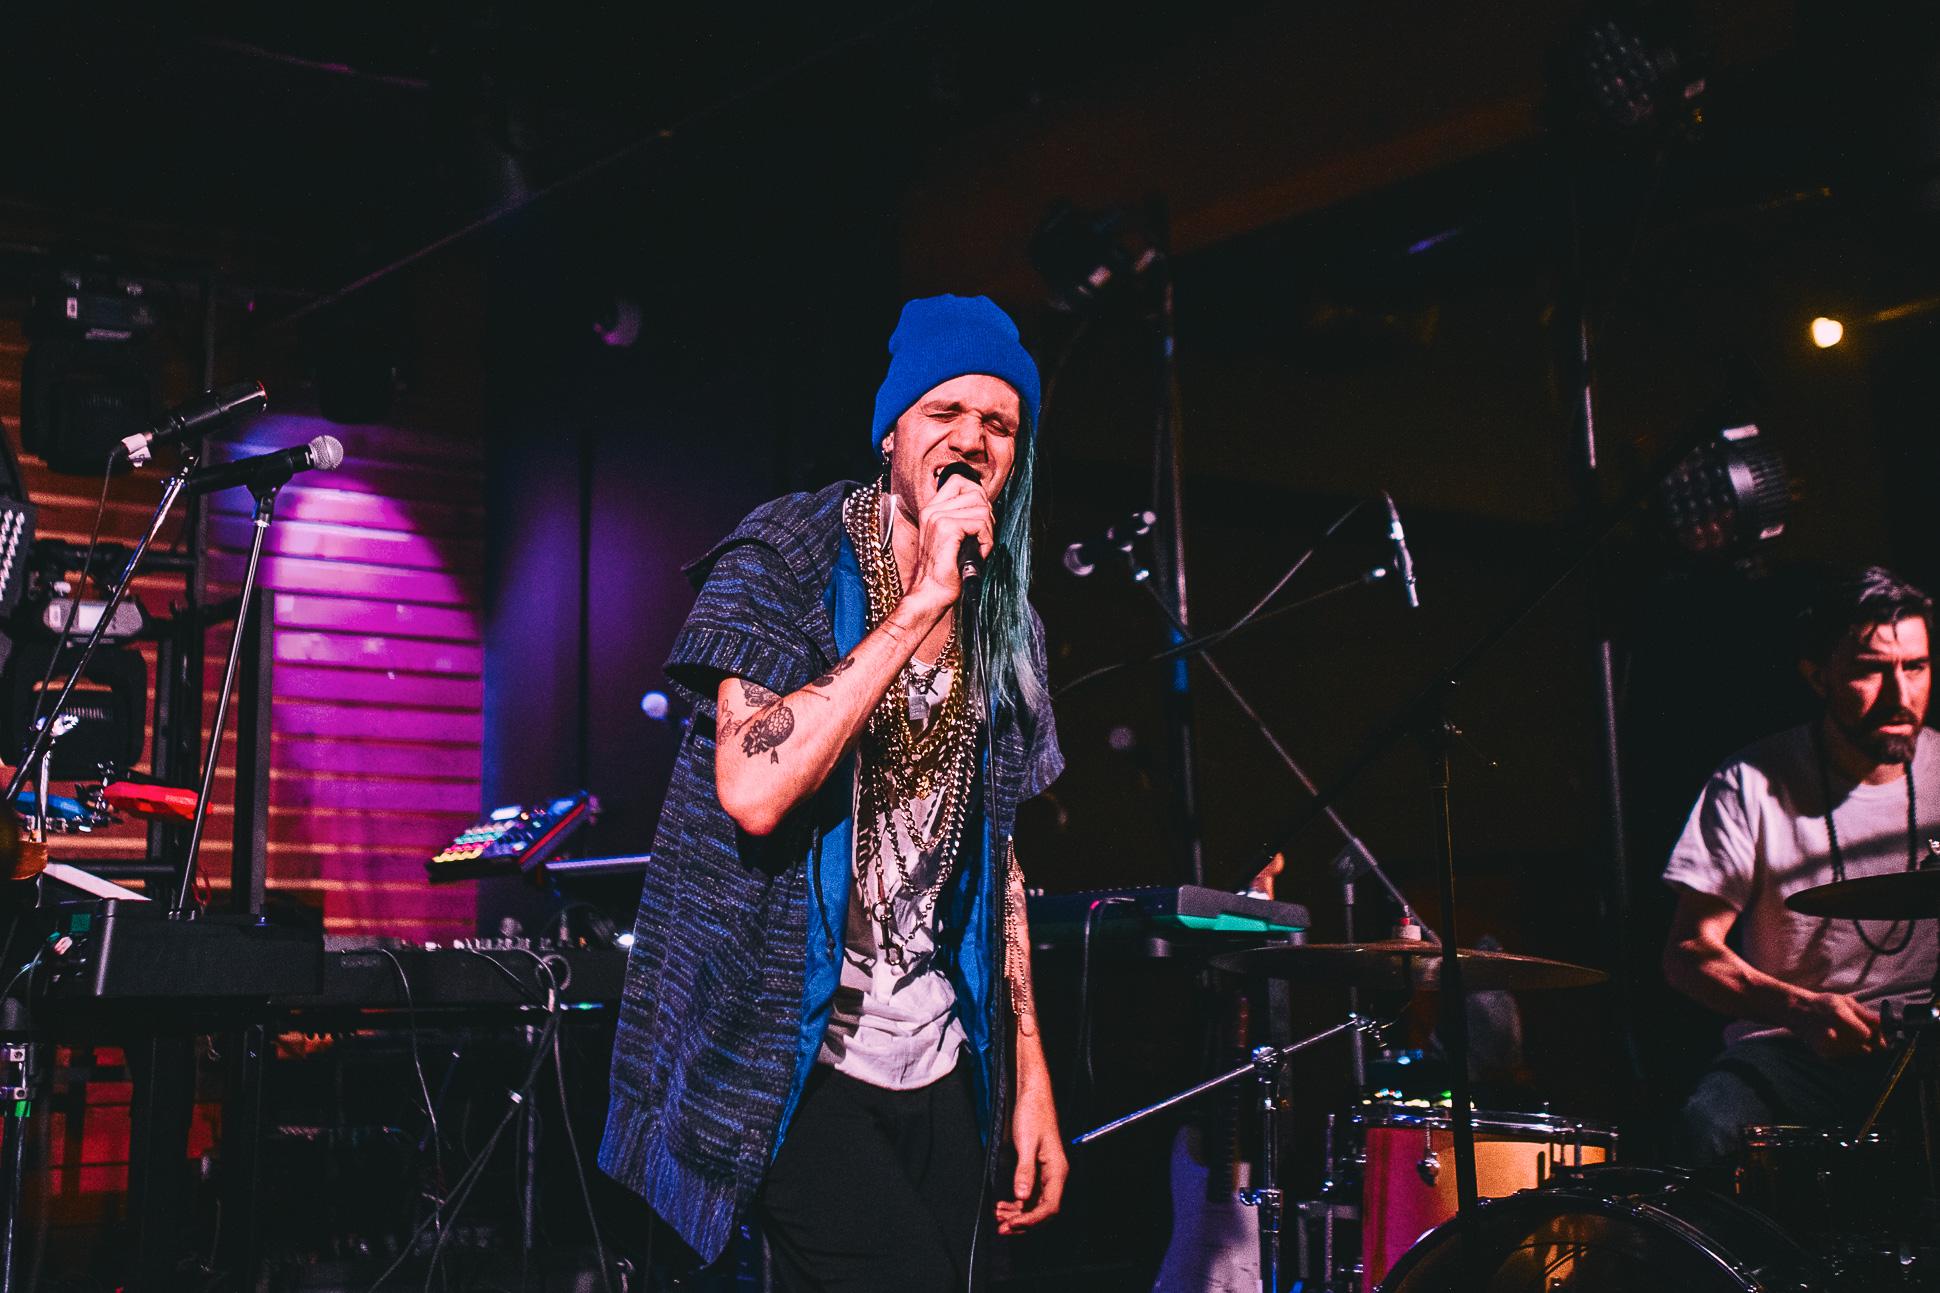 YoungAndSick-FortuneSoundClub-24-01-2019-Vancouver-06.jpg